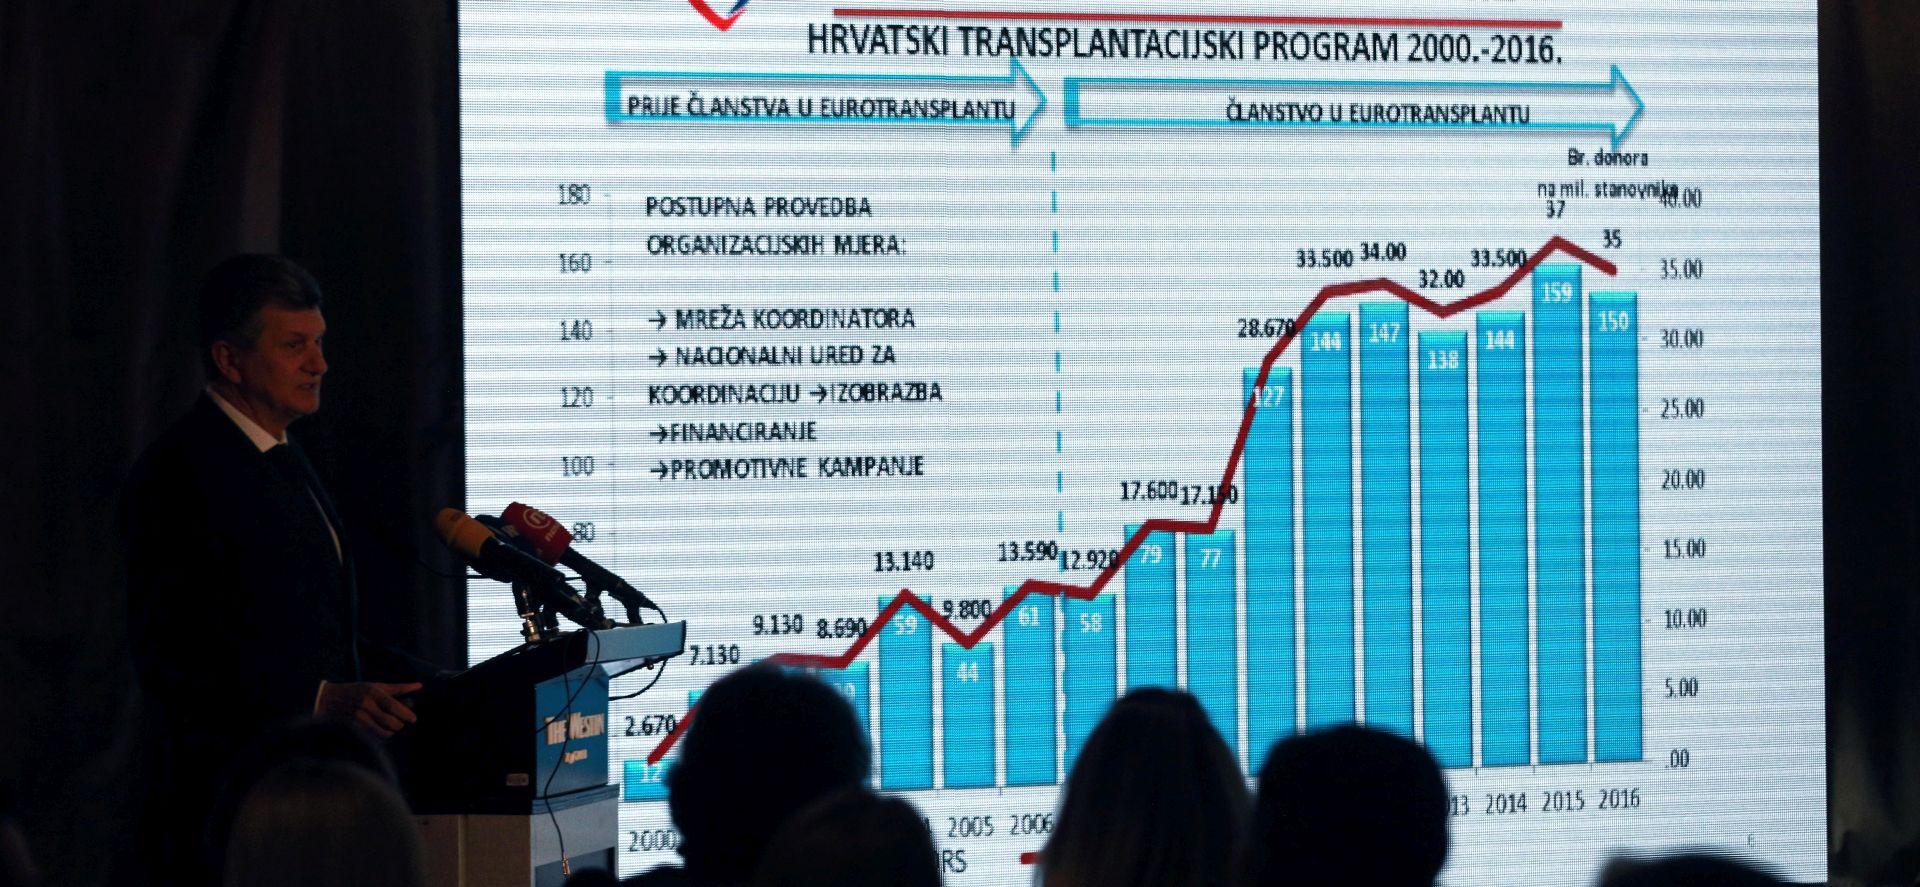 'Zdravstveni sustav stabilan, ali s brojnim poteškoćama'